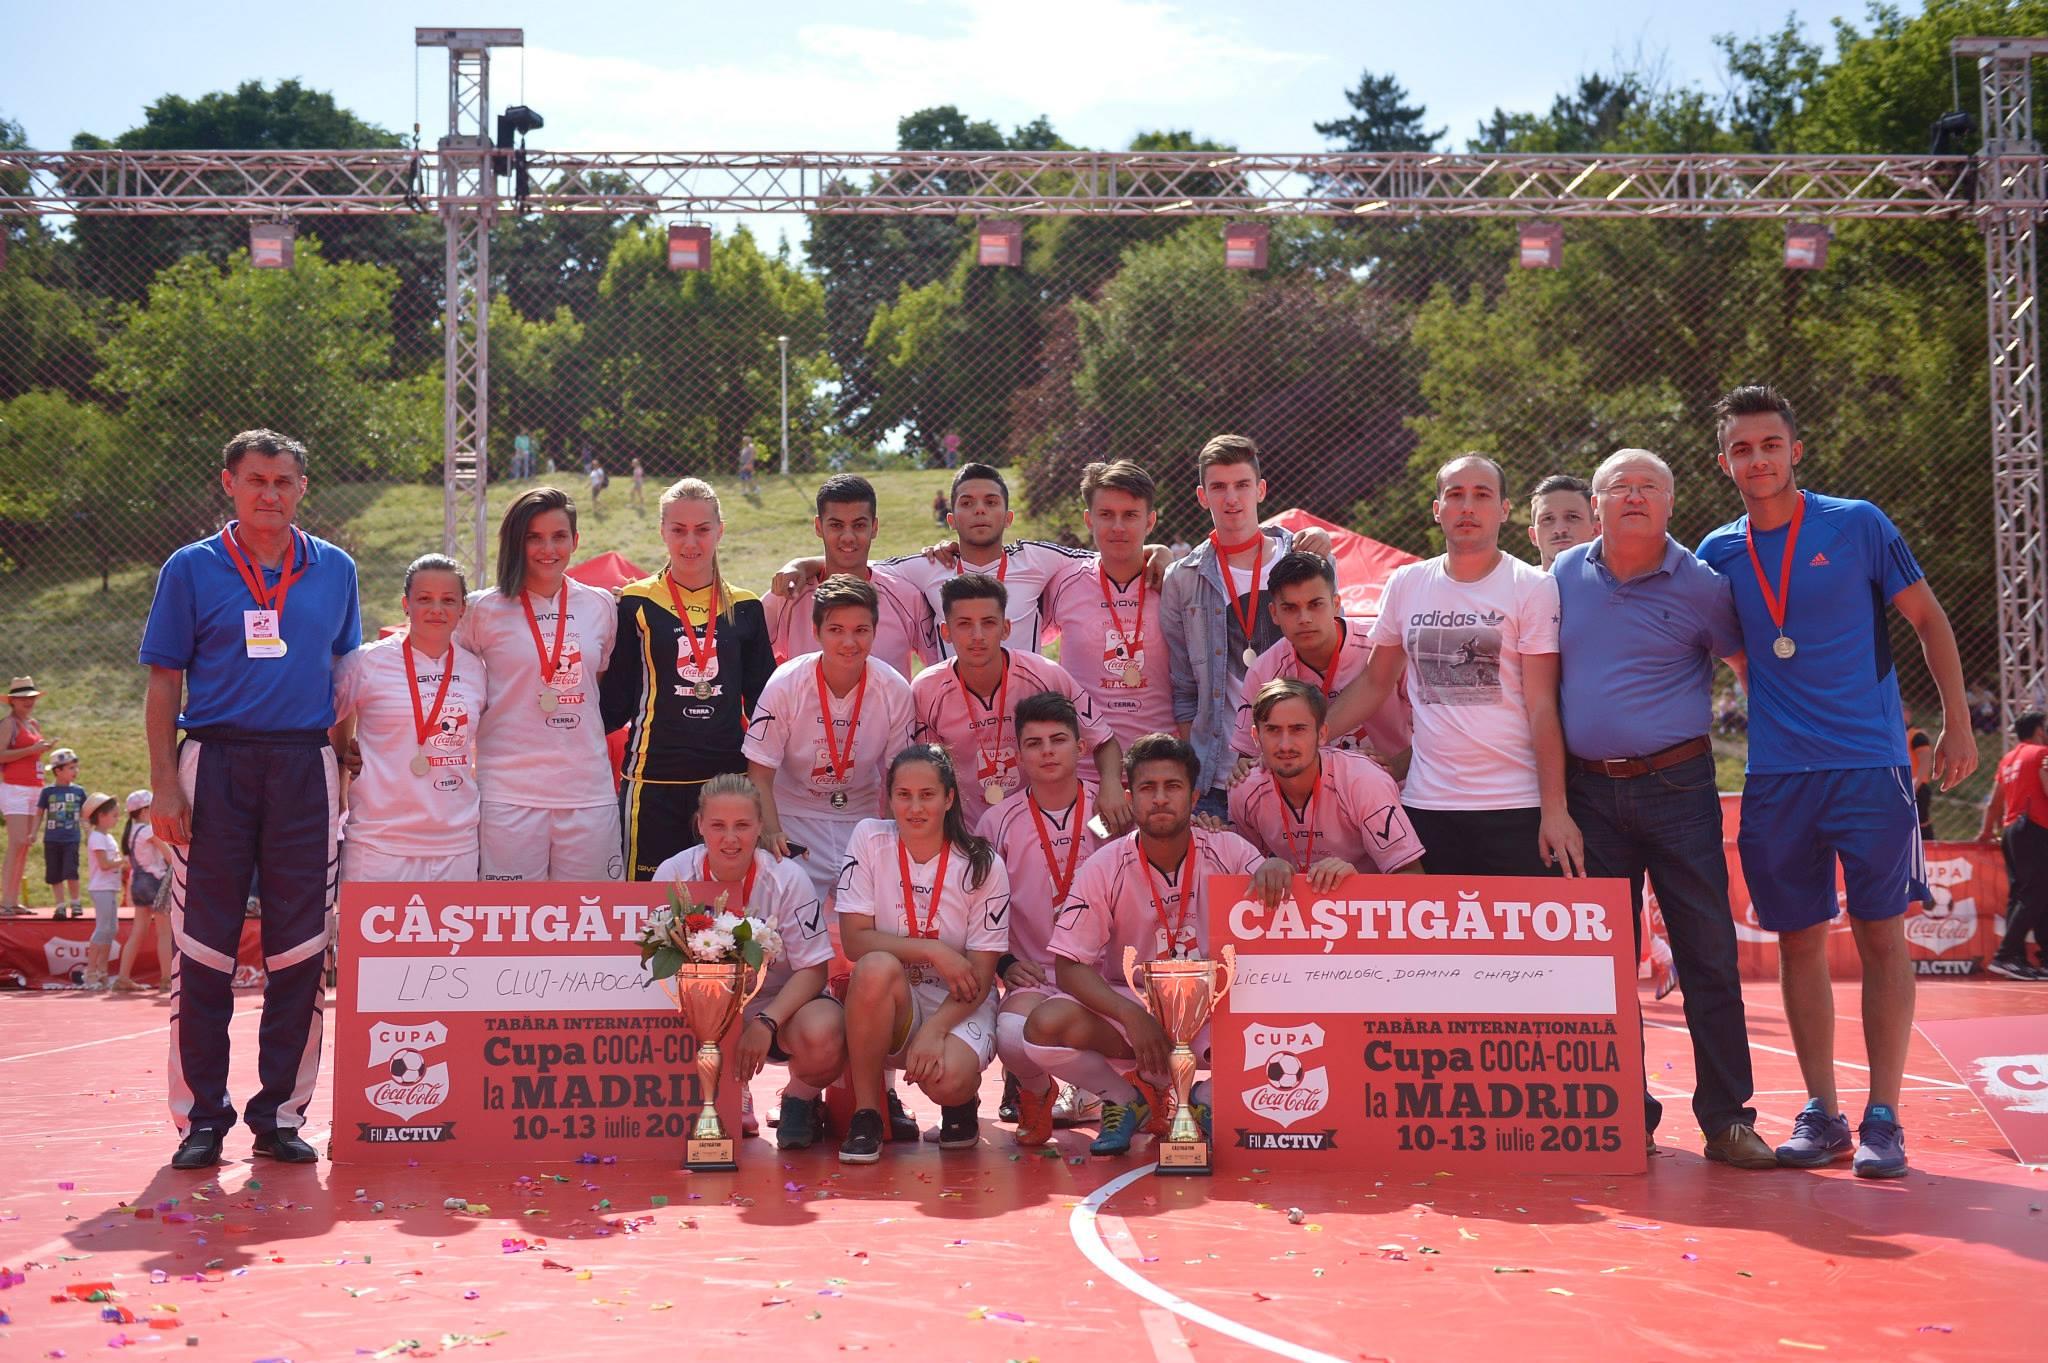 (P) Spectacol pe teren la ultimele meciuri din Cupa Coca-Cola. Liceul Tehnologic Doamna Chiajna si LPS Cluj merg la Madrid